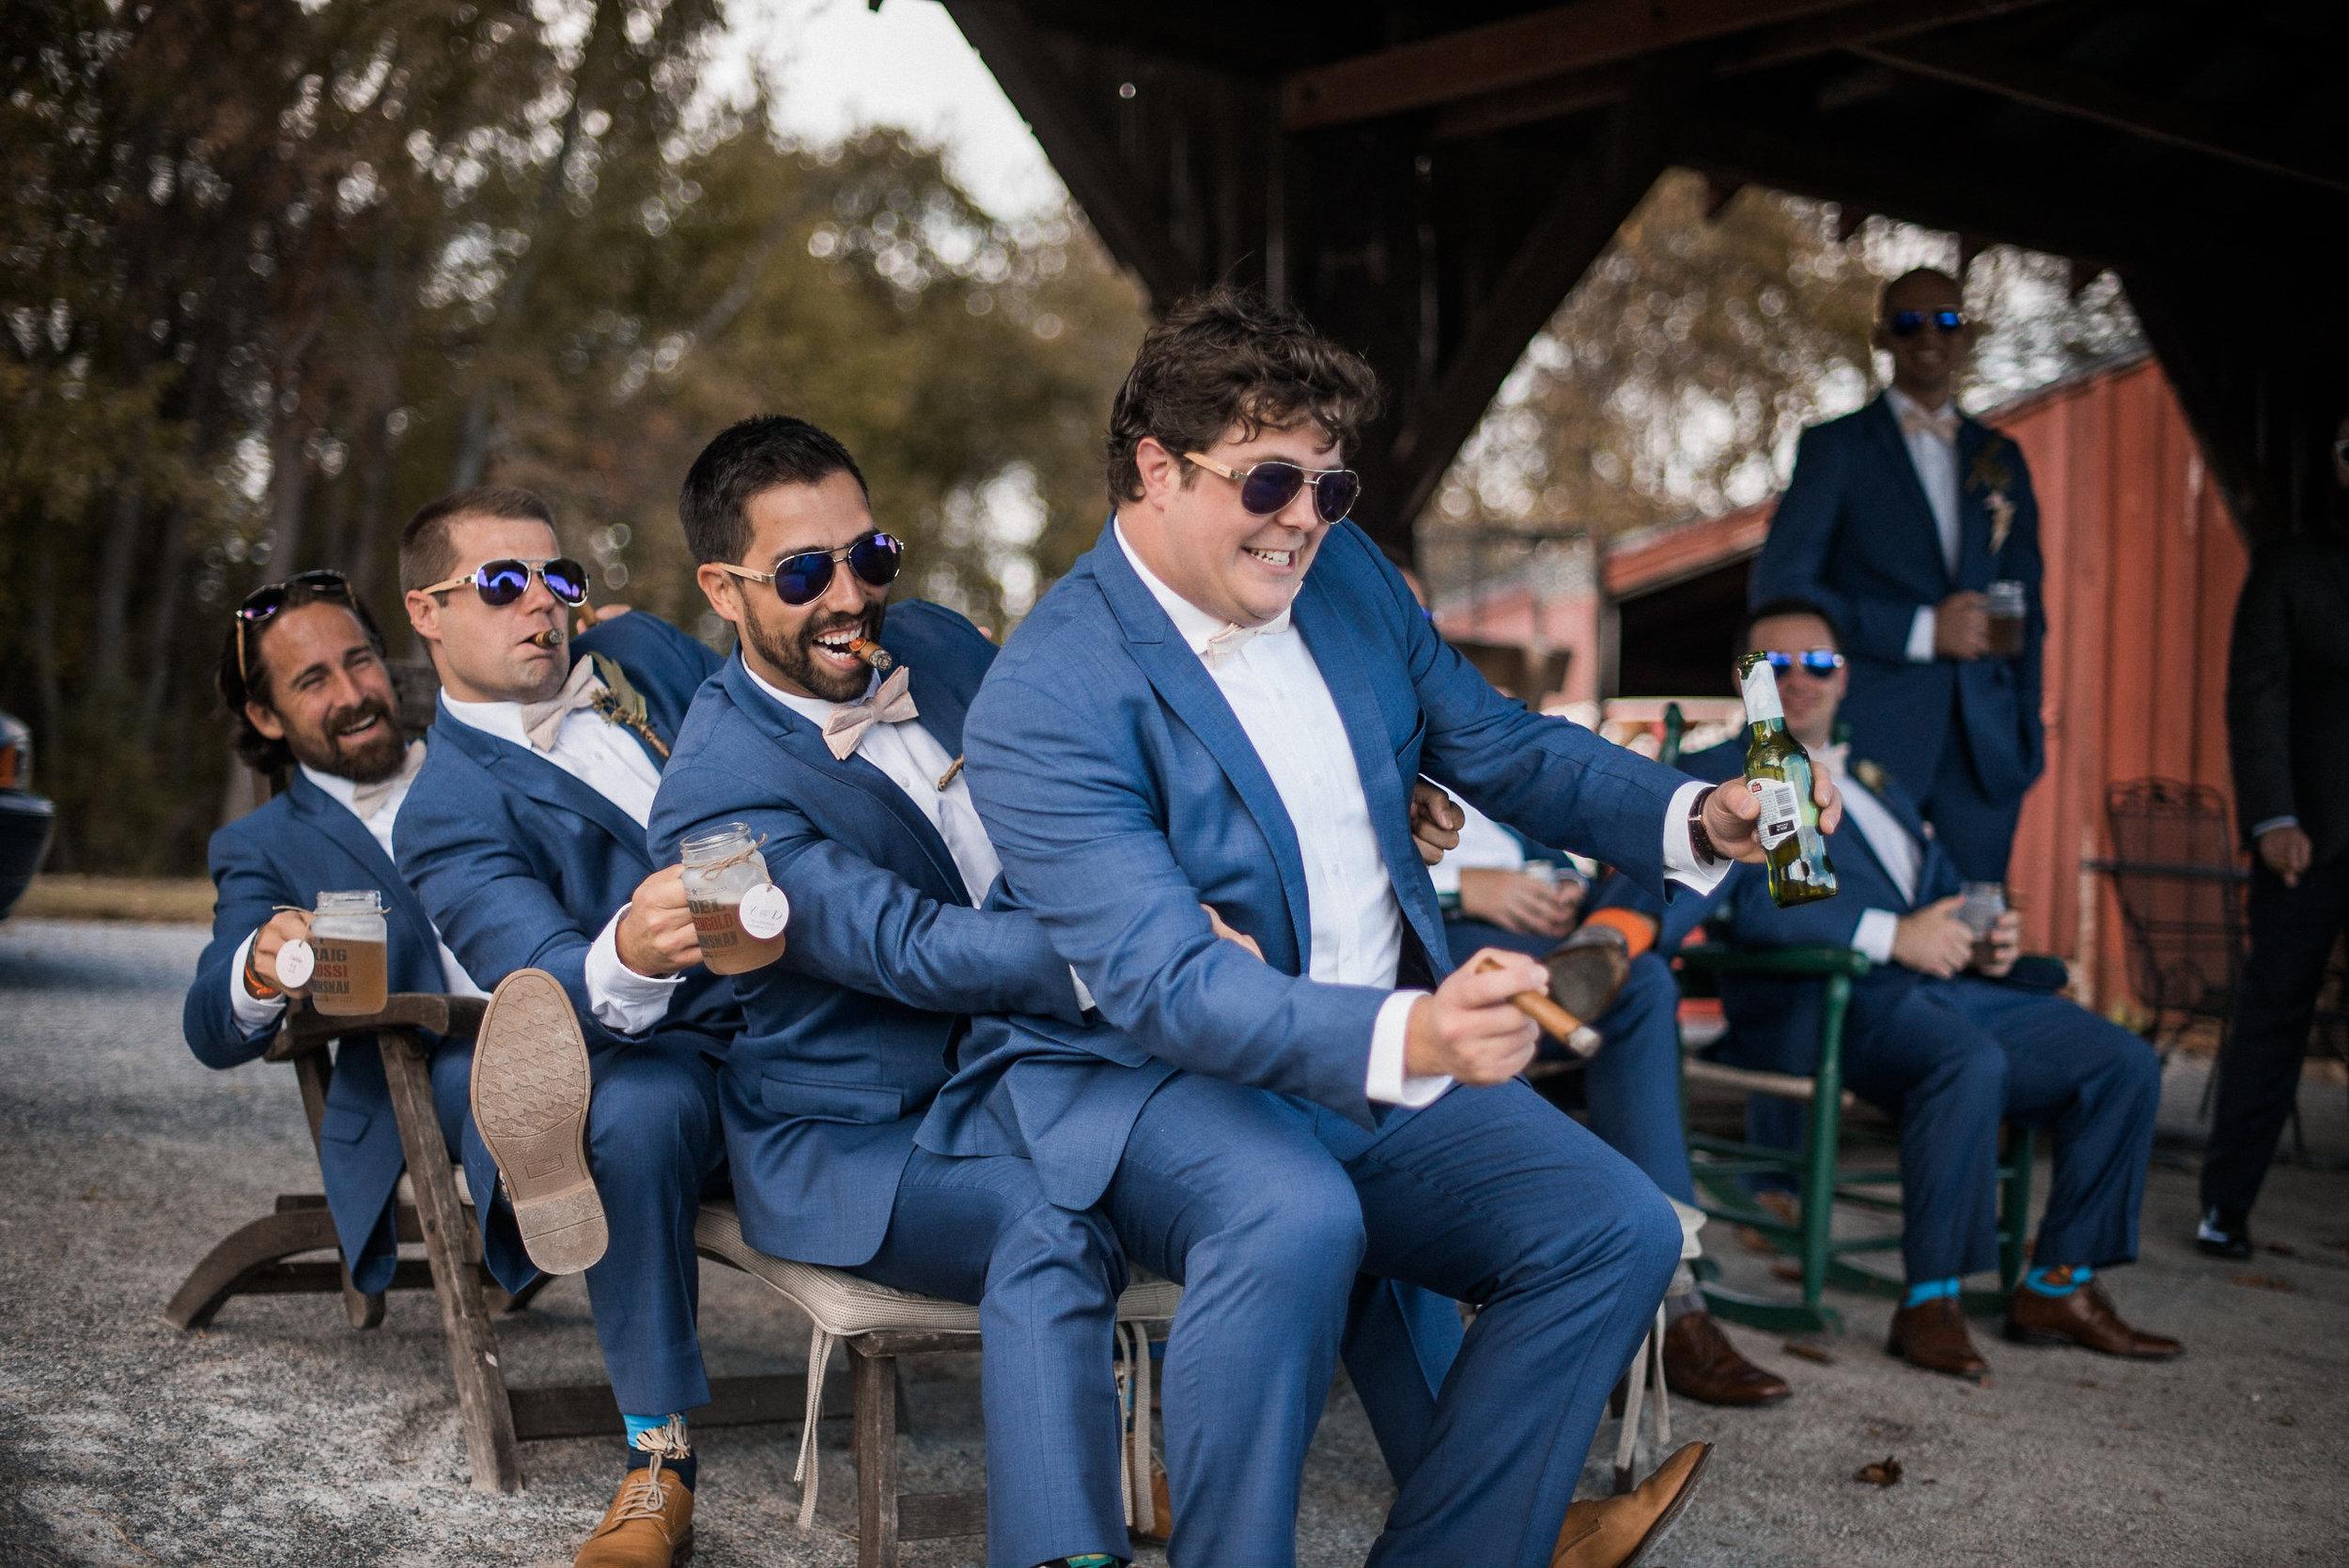 Groom and groomsmen posing silly